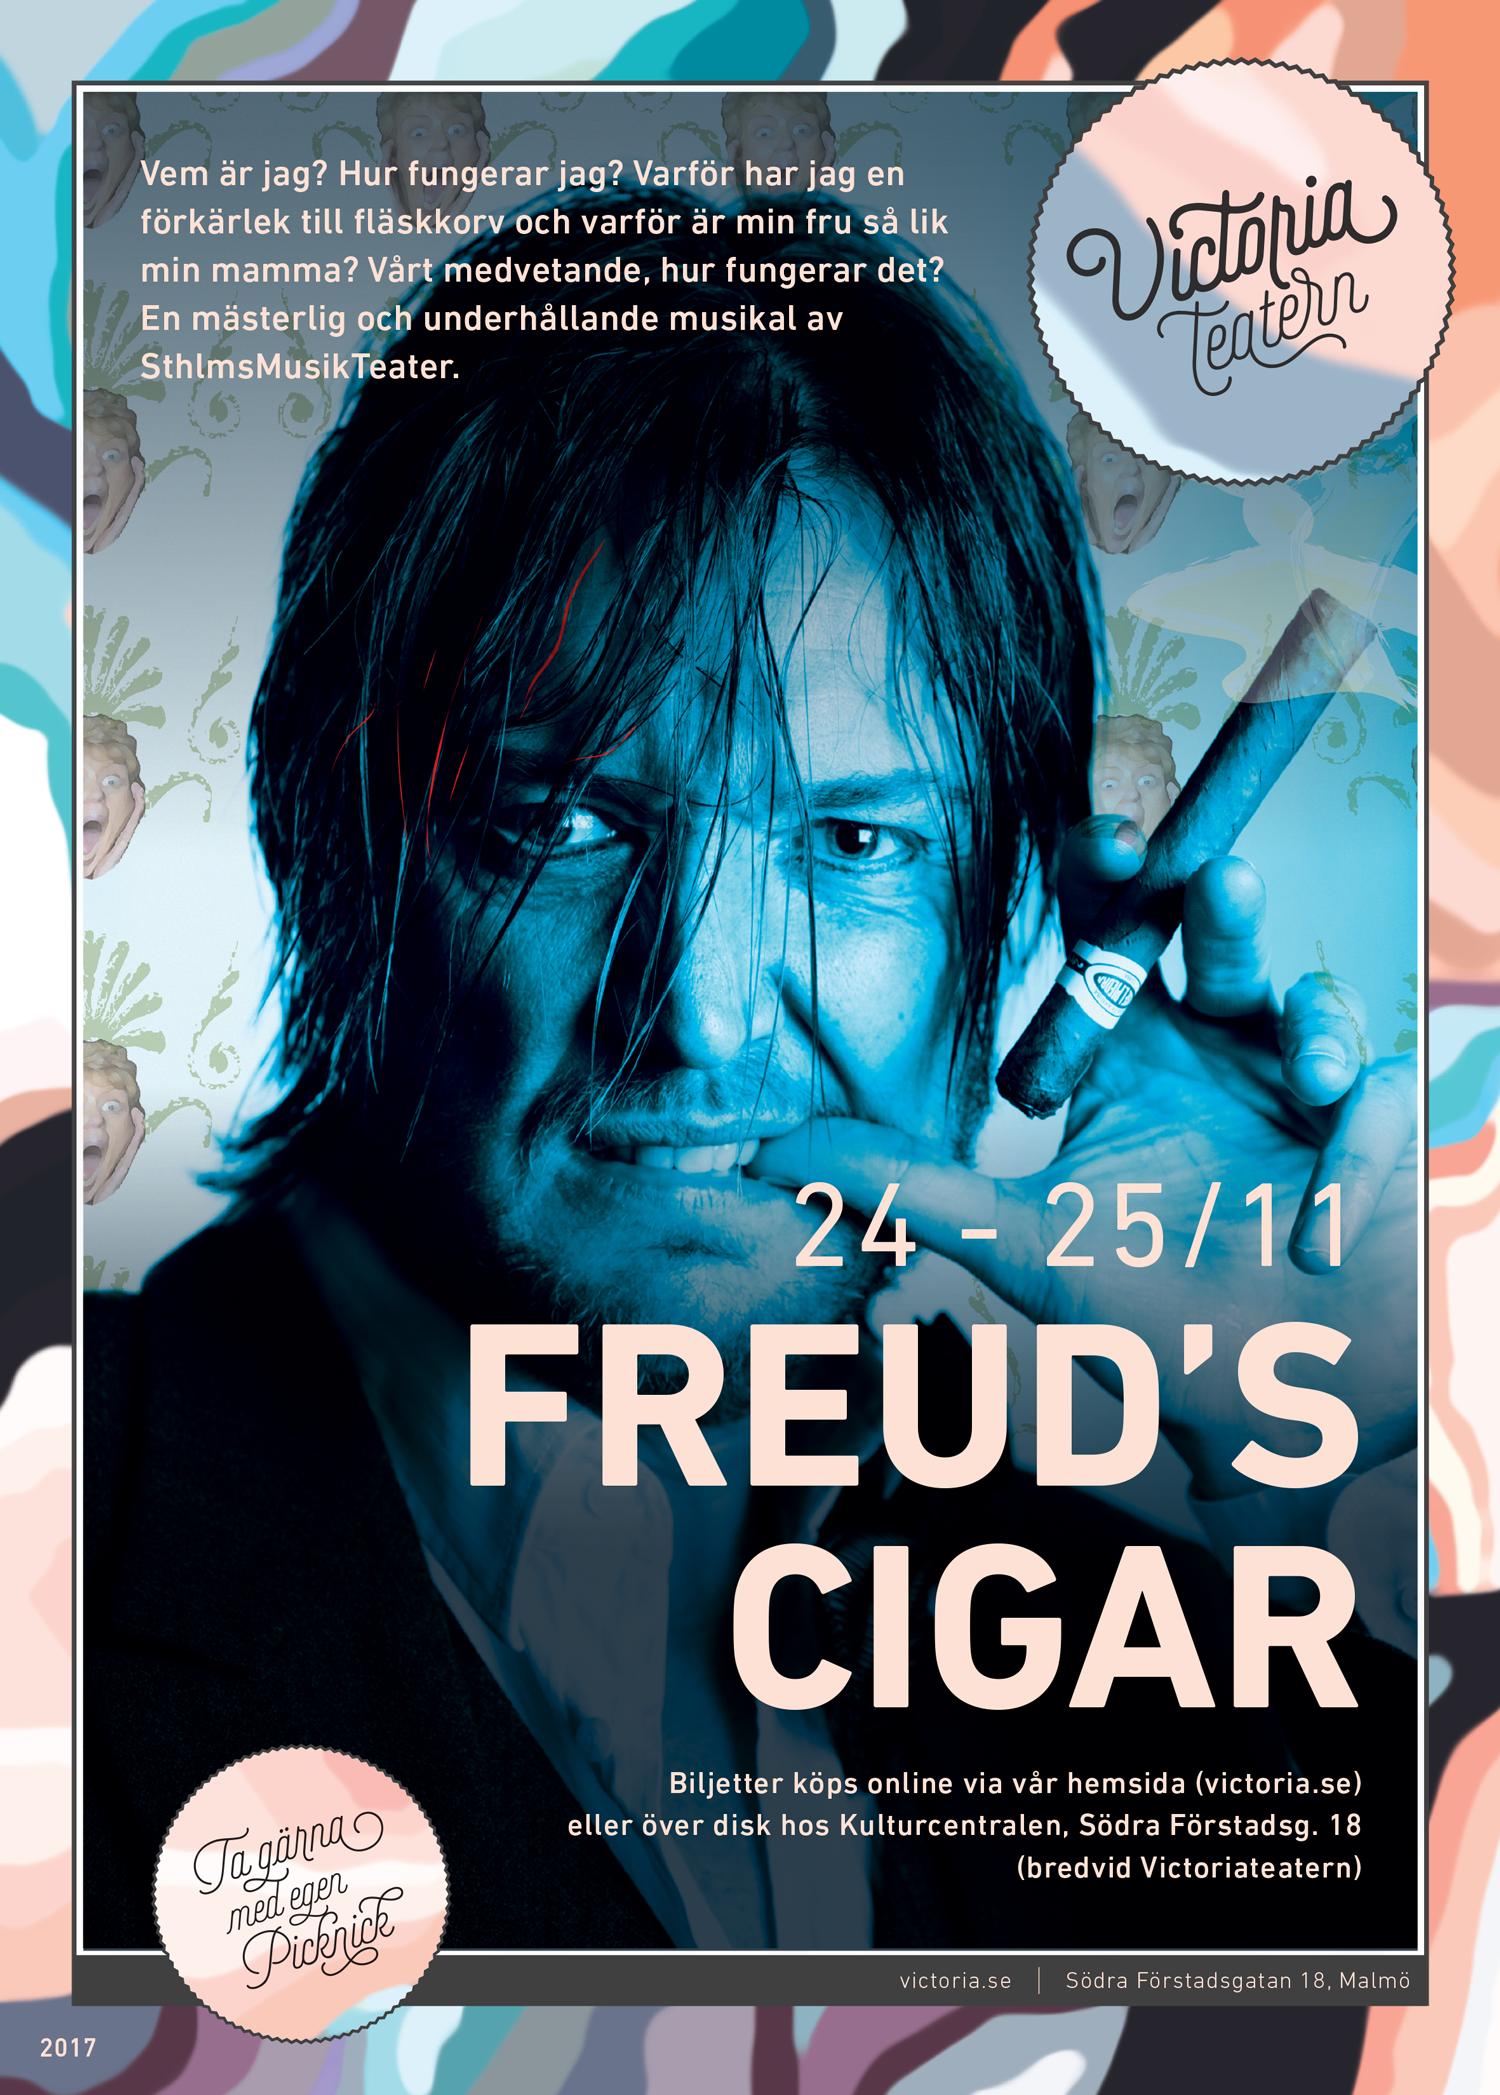 freuds_cigar.png